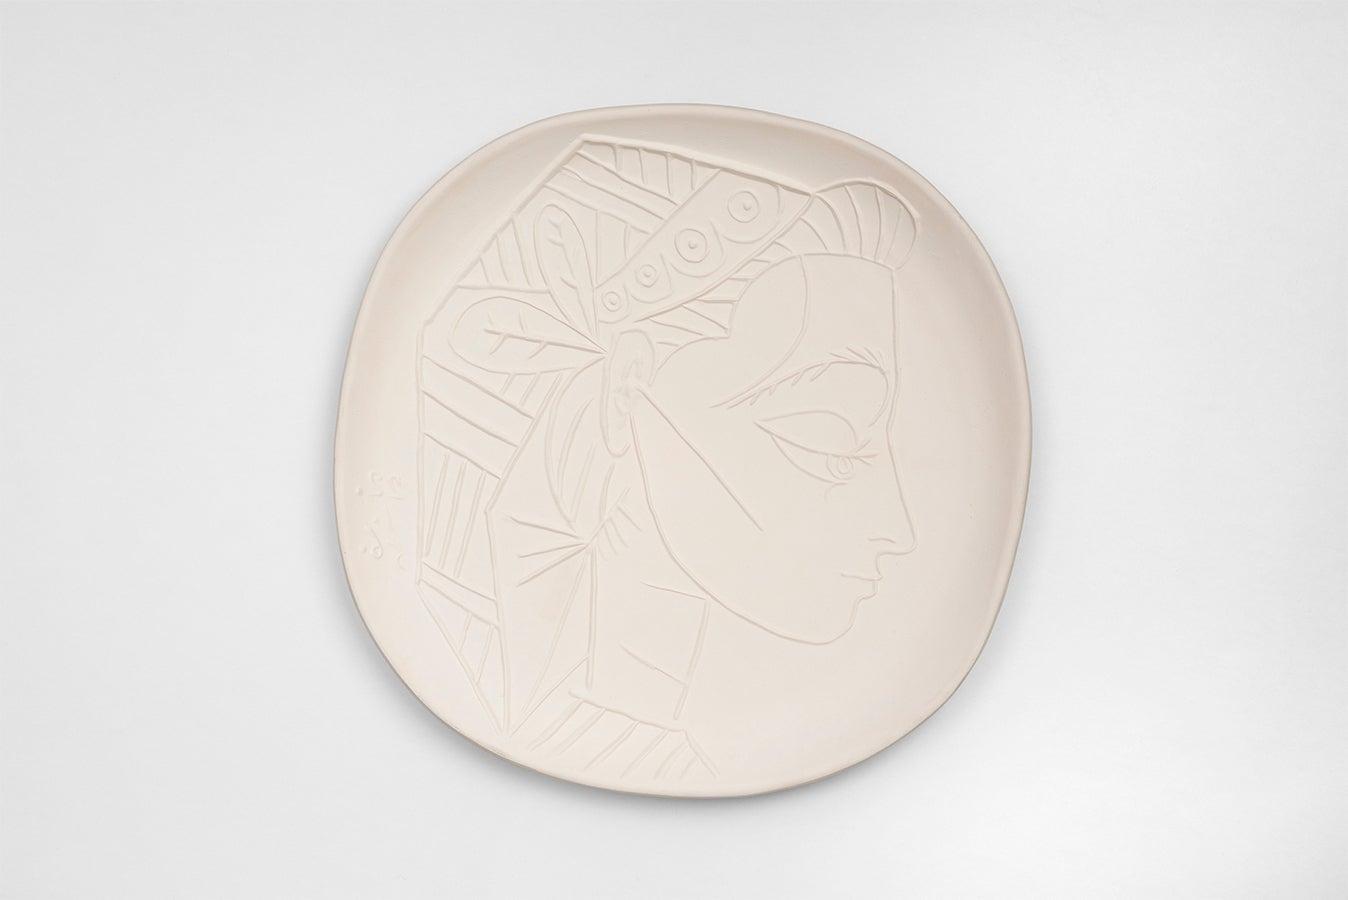 Pablo Picasso - Madoura Ceramic: Jacqueline's Profile (Profil de Jacqueline)